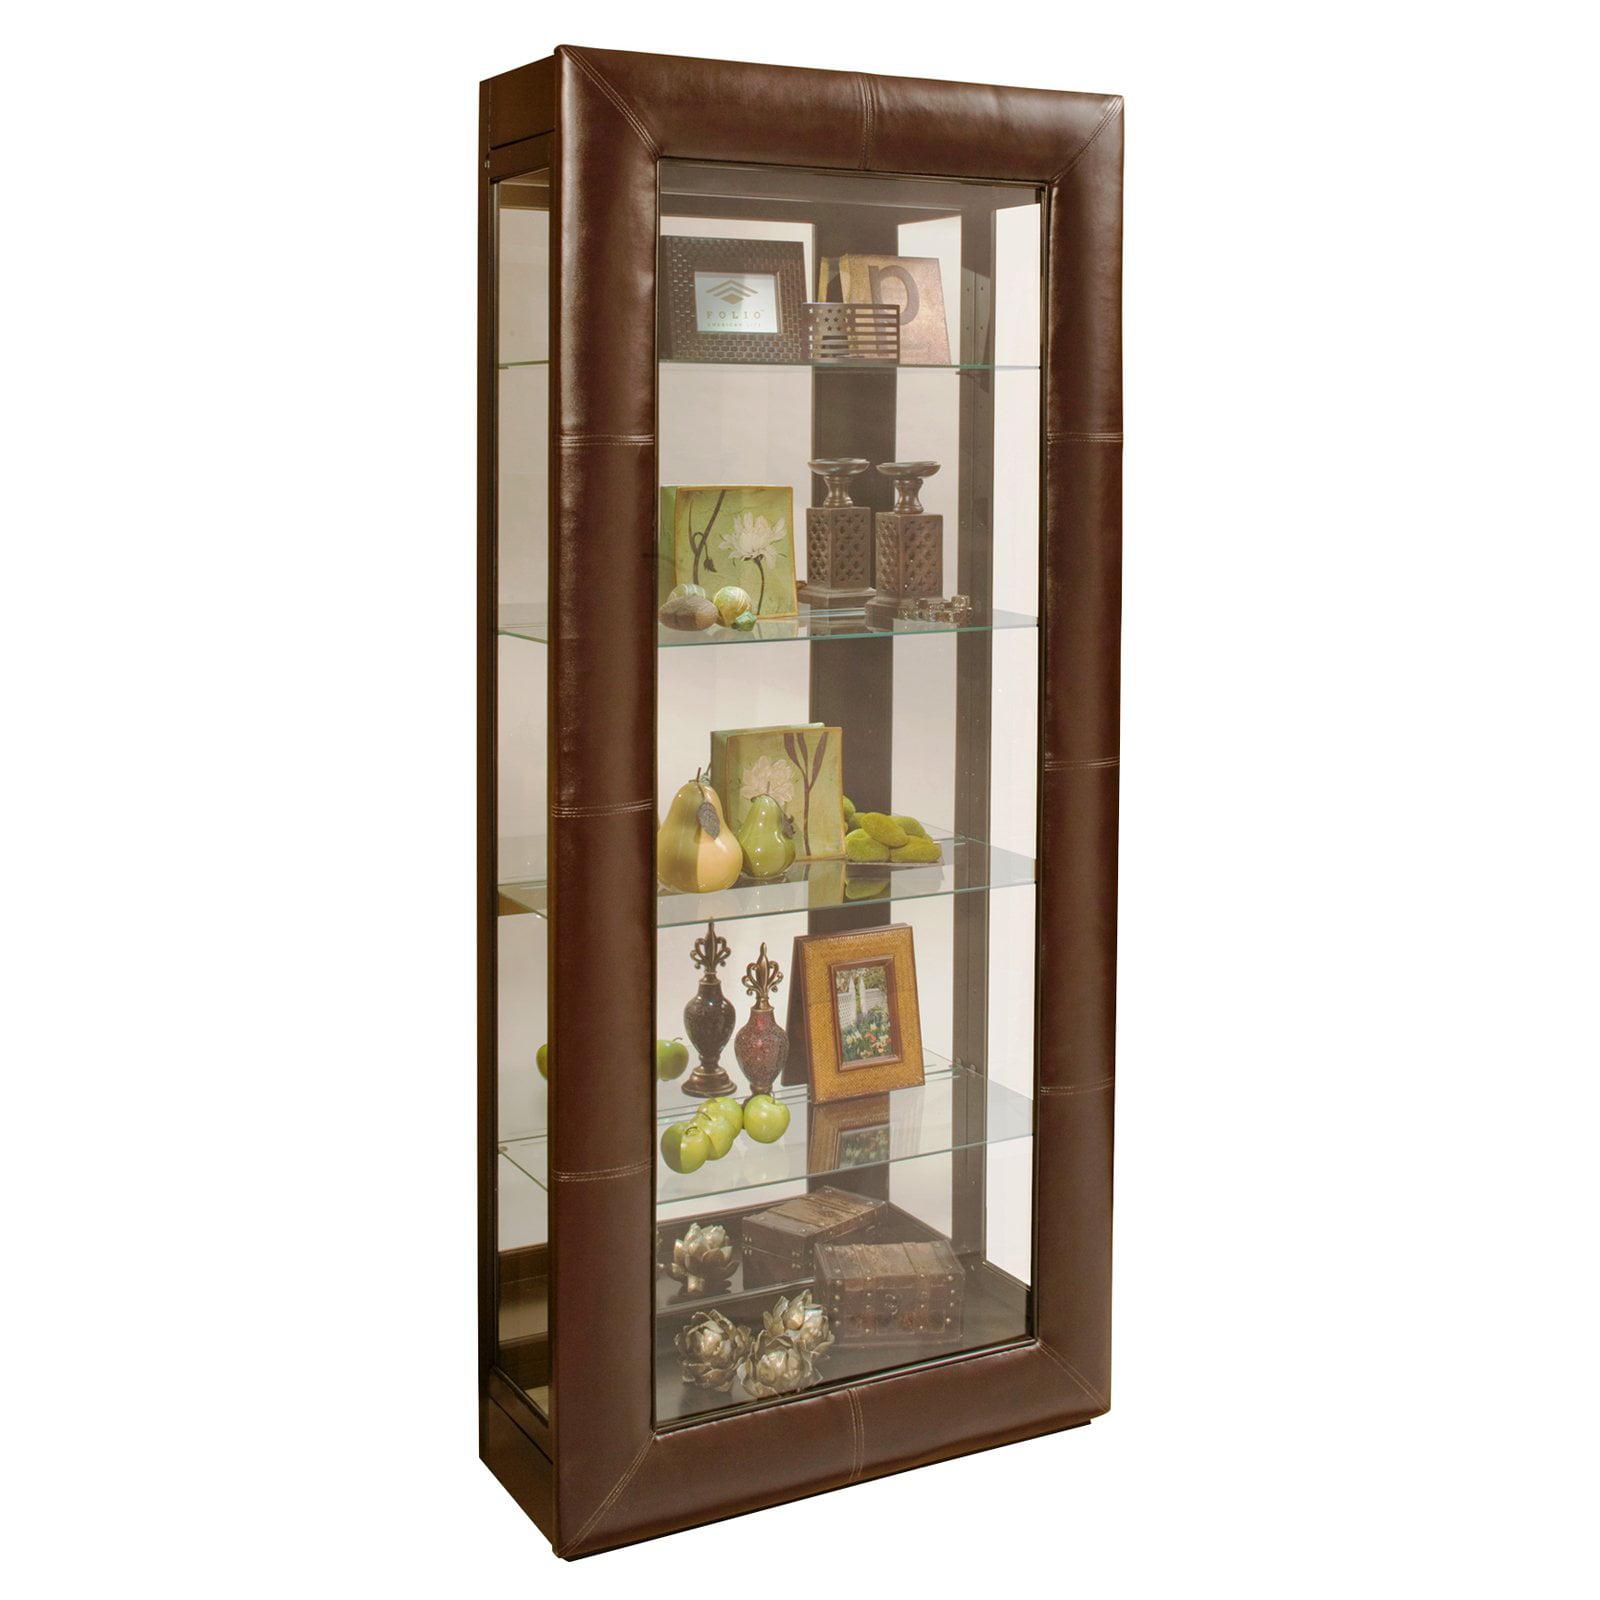 Philip Reinisch Company Folio Alamance Accent Curio Cabinet